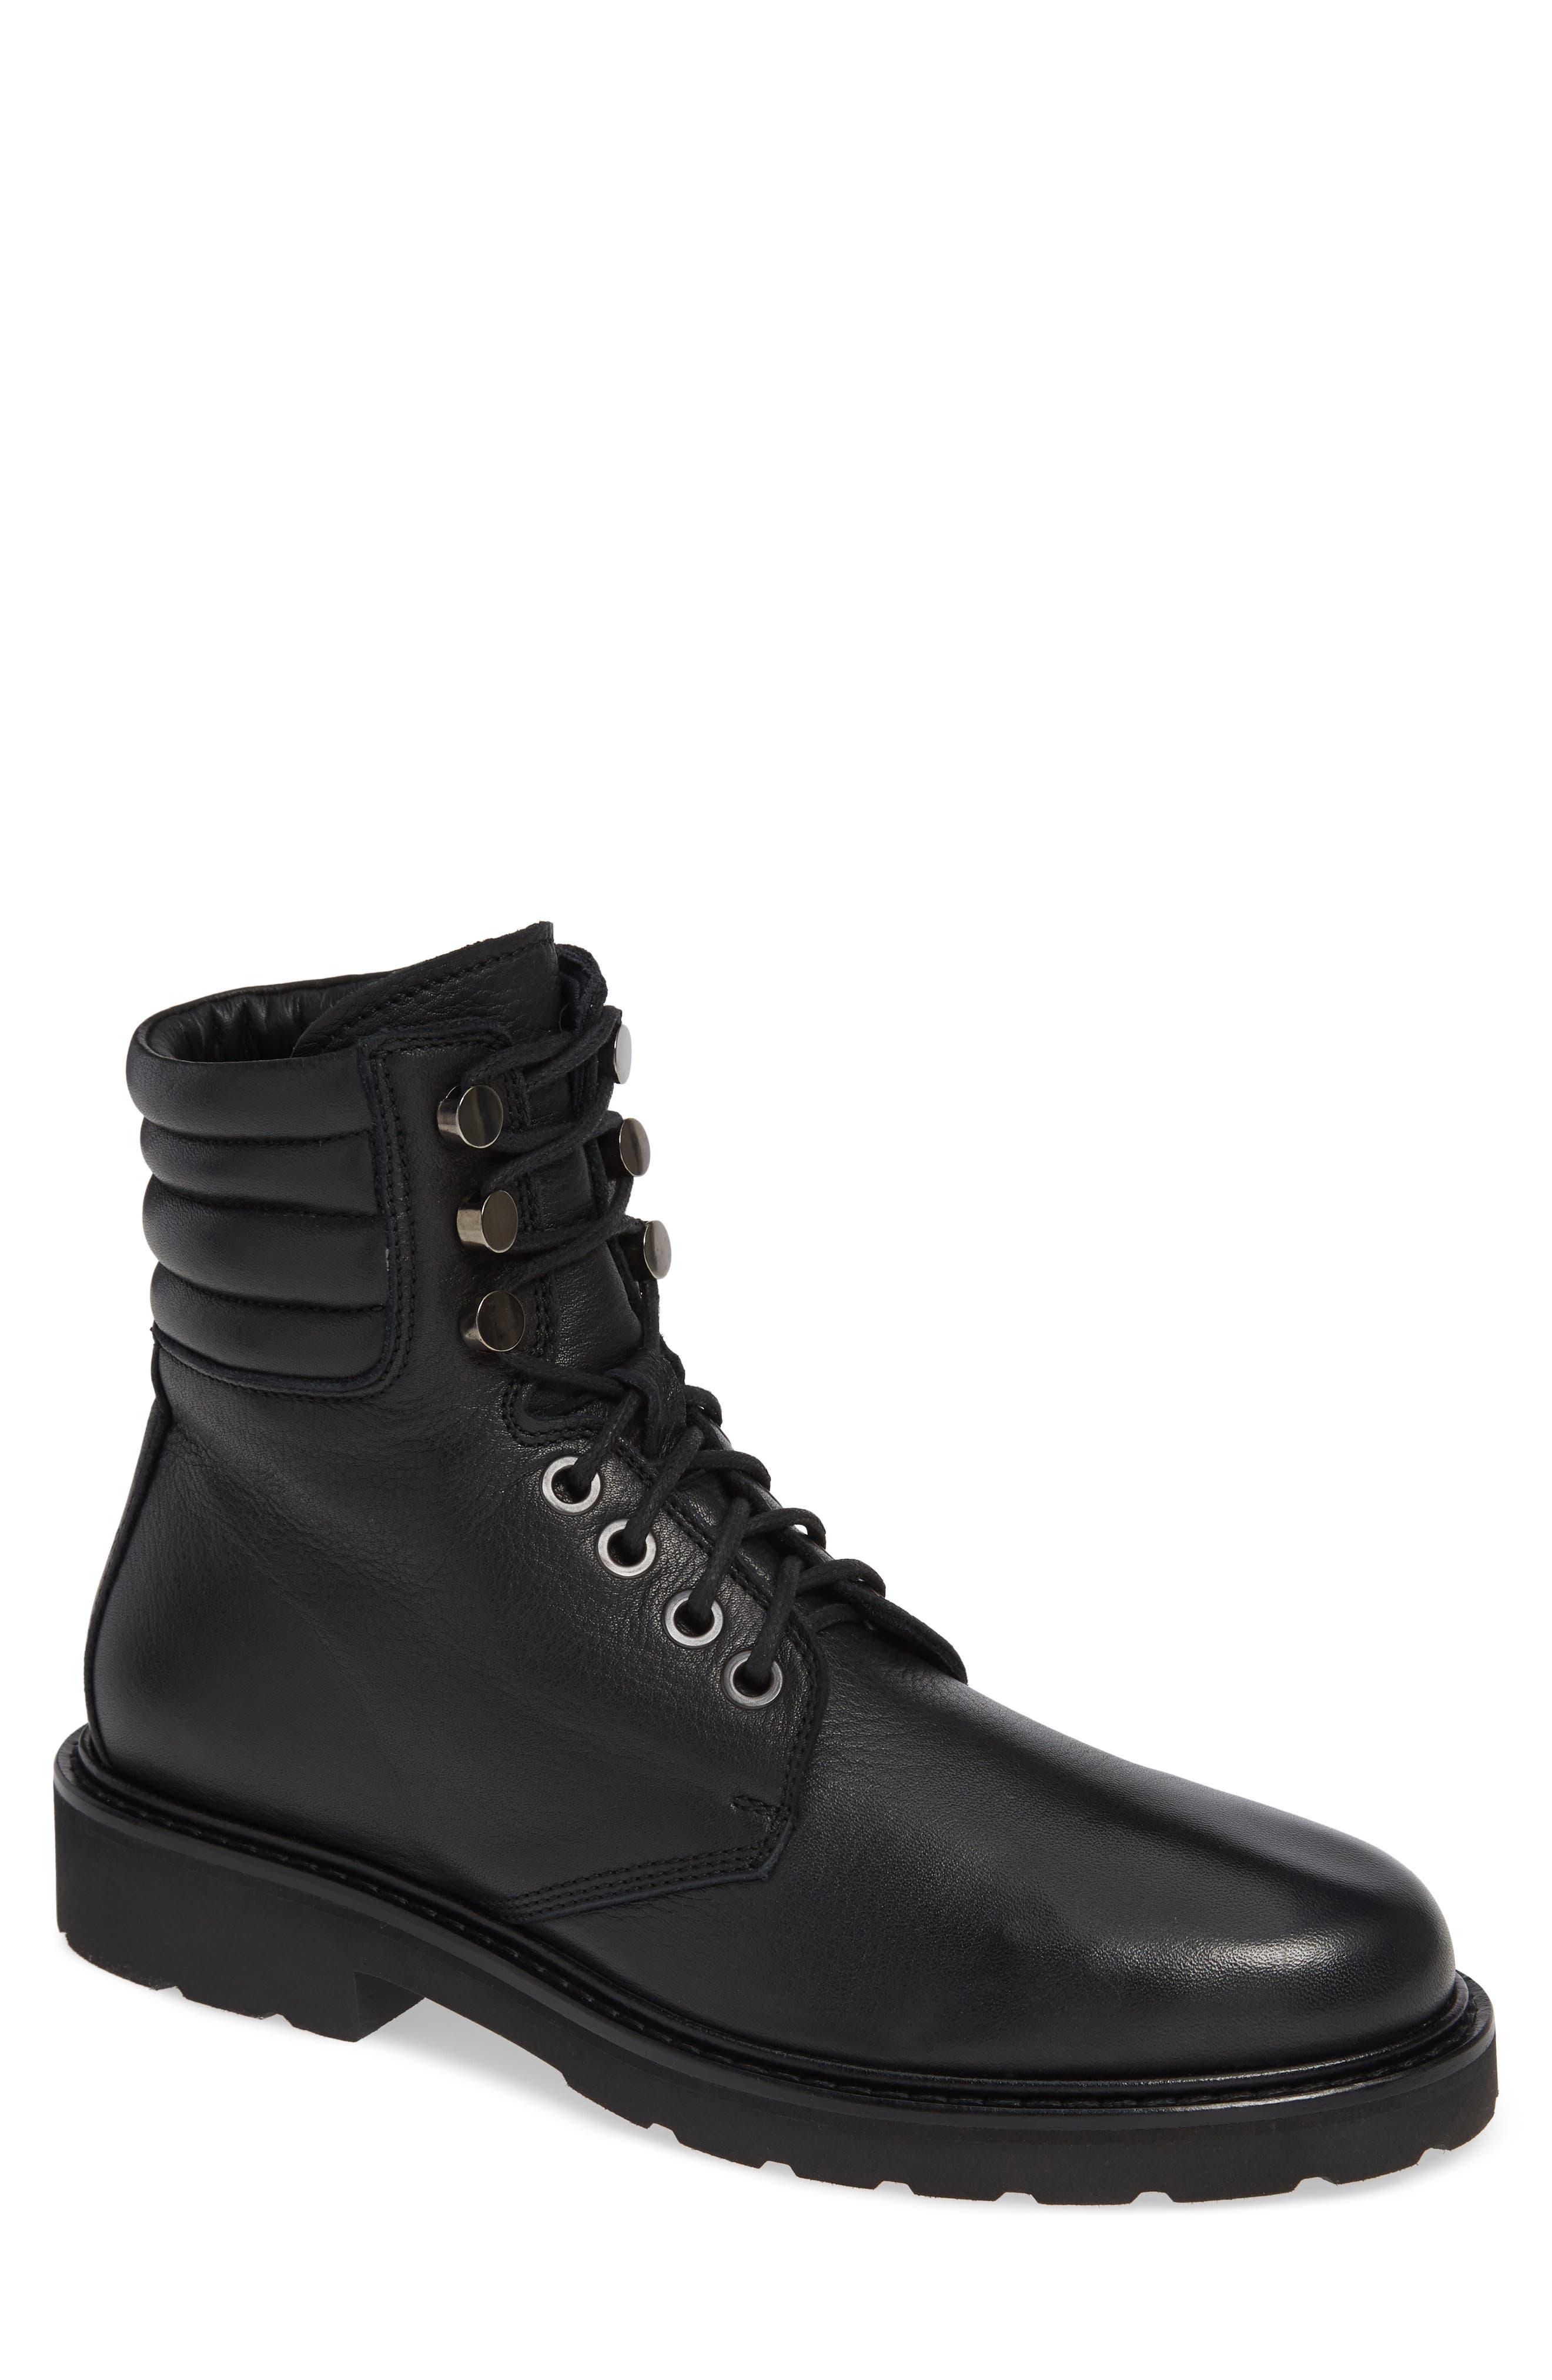 Aquatalia Heath Water Resistant Plain Toe Waterproof Boot, Black